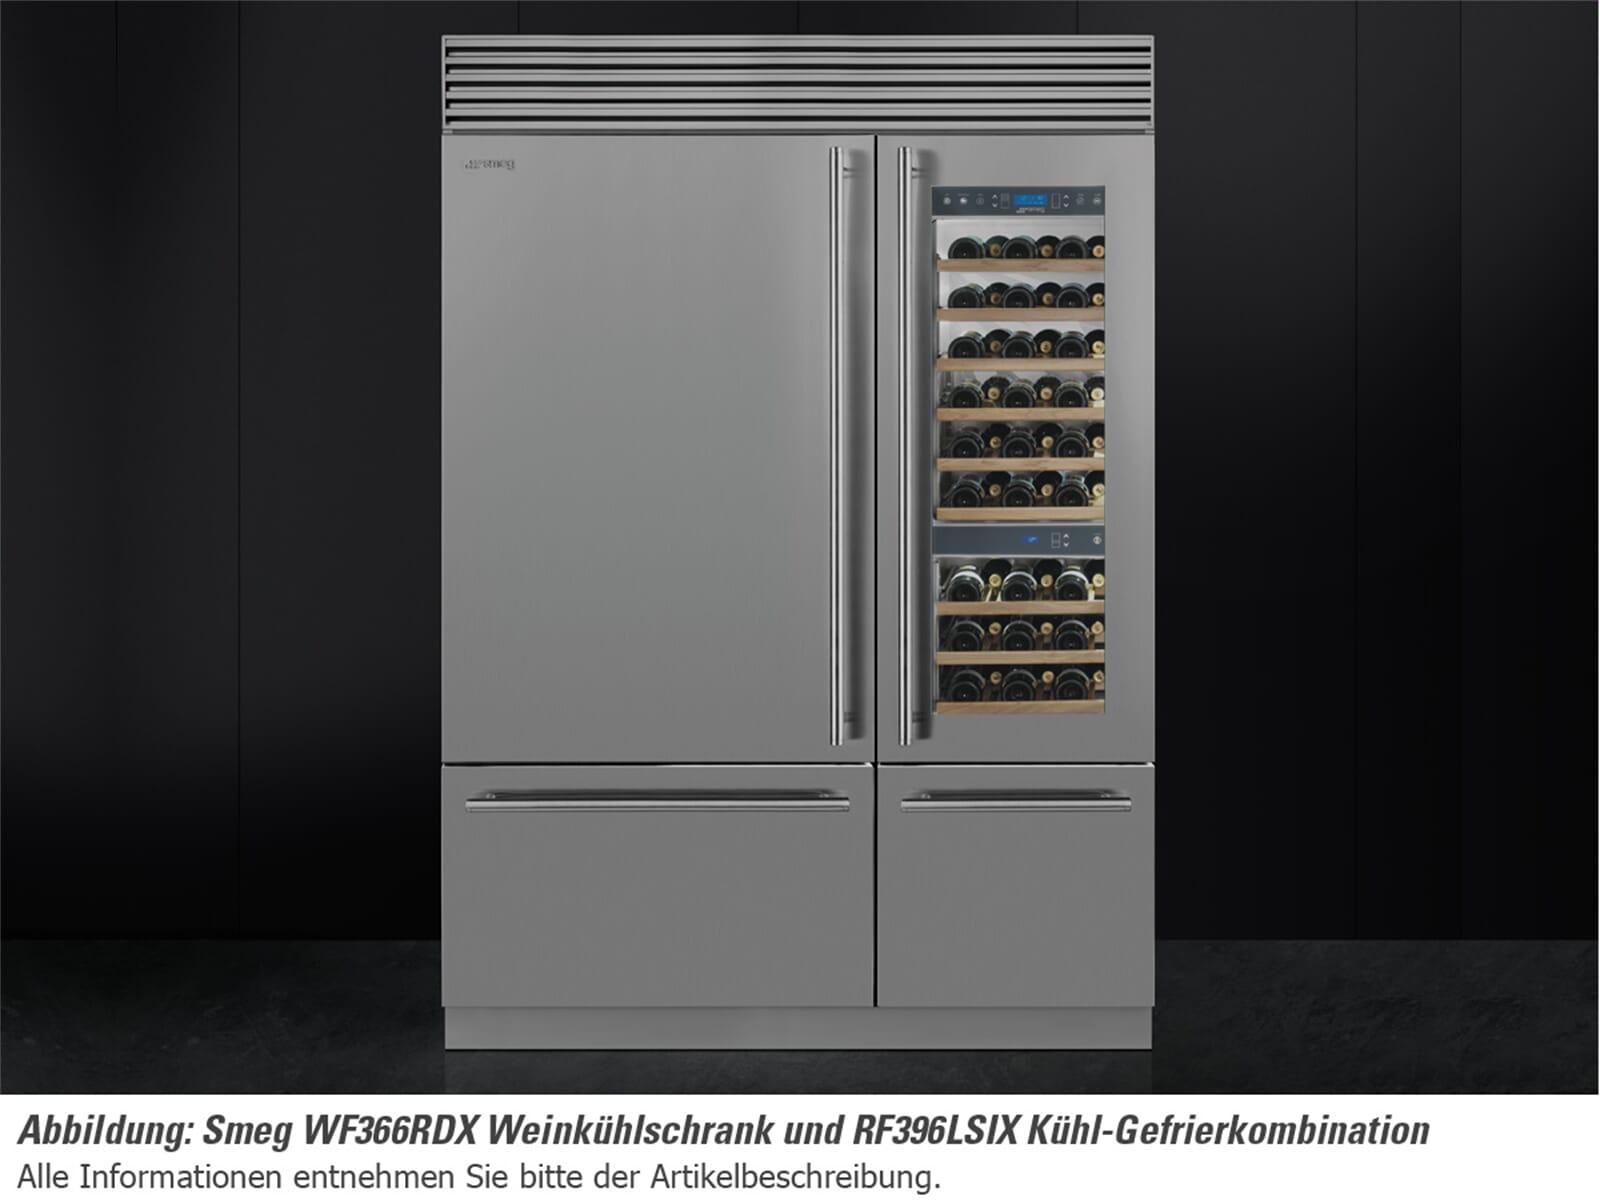 Smeg Kühlschrank Preise : Smeg kühlschrank preise smeg kühlschrank fab rdbb küchenstudio